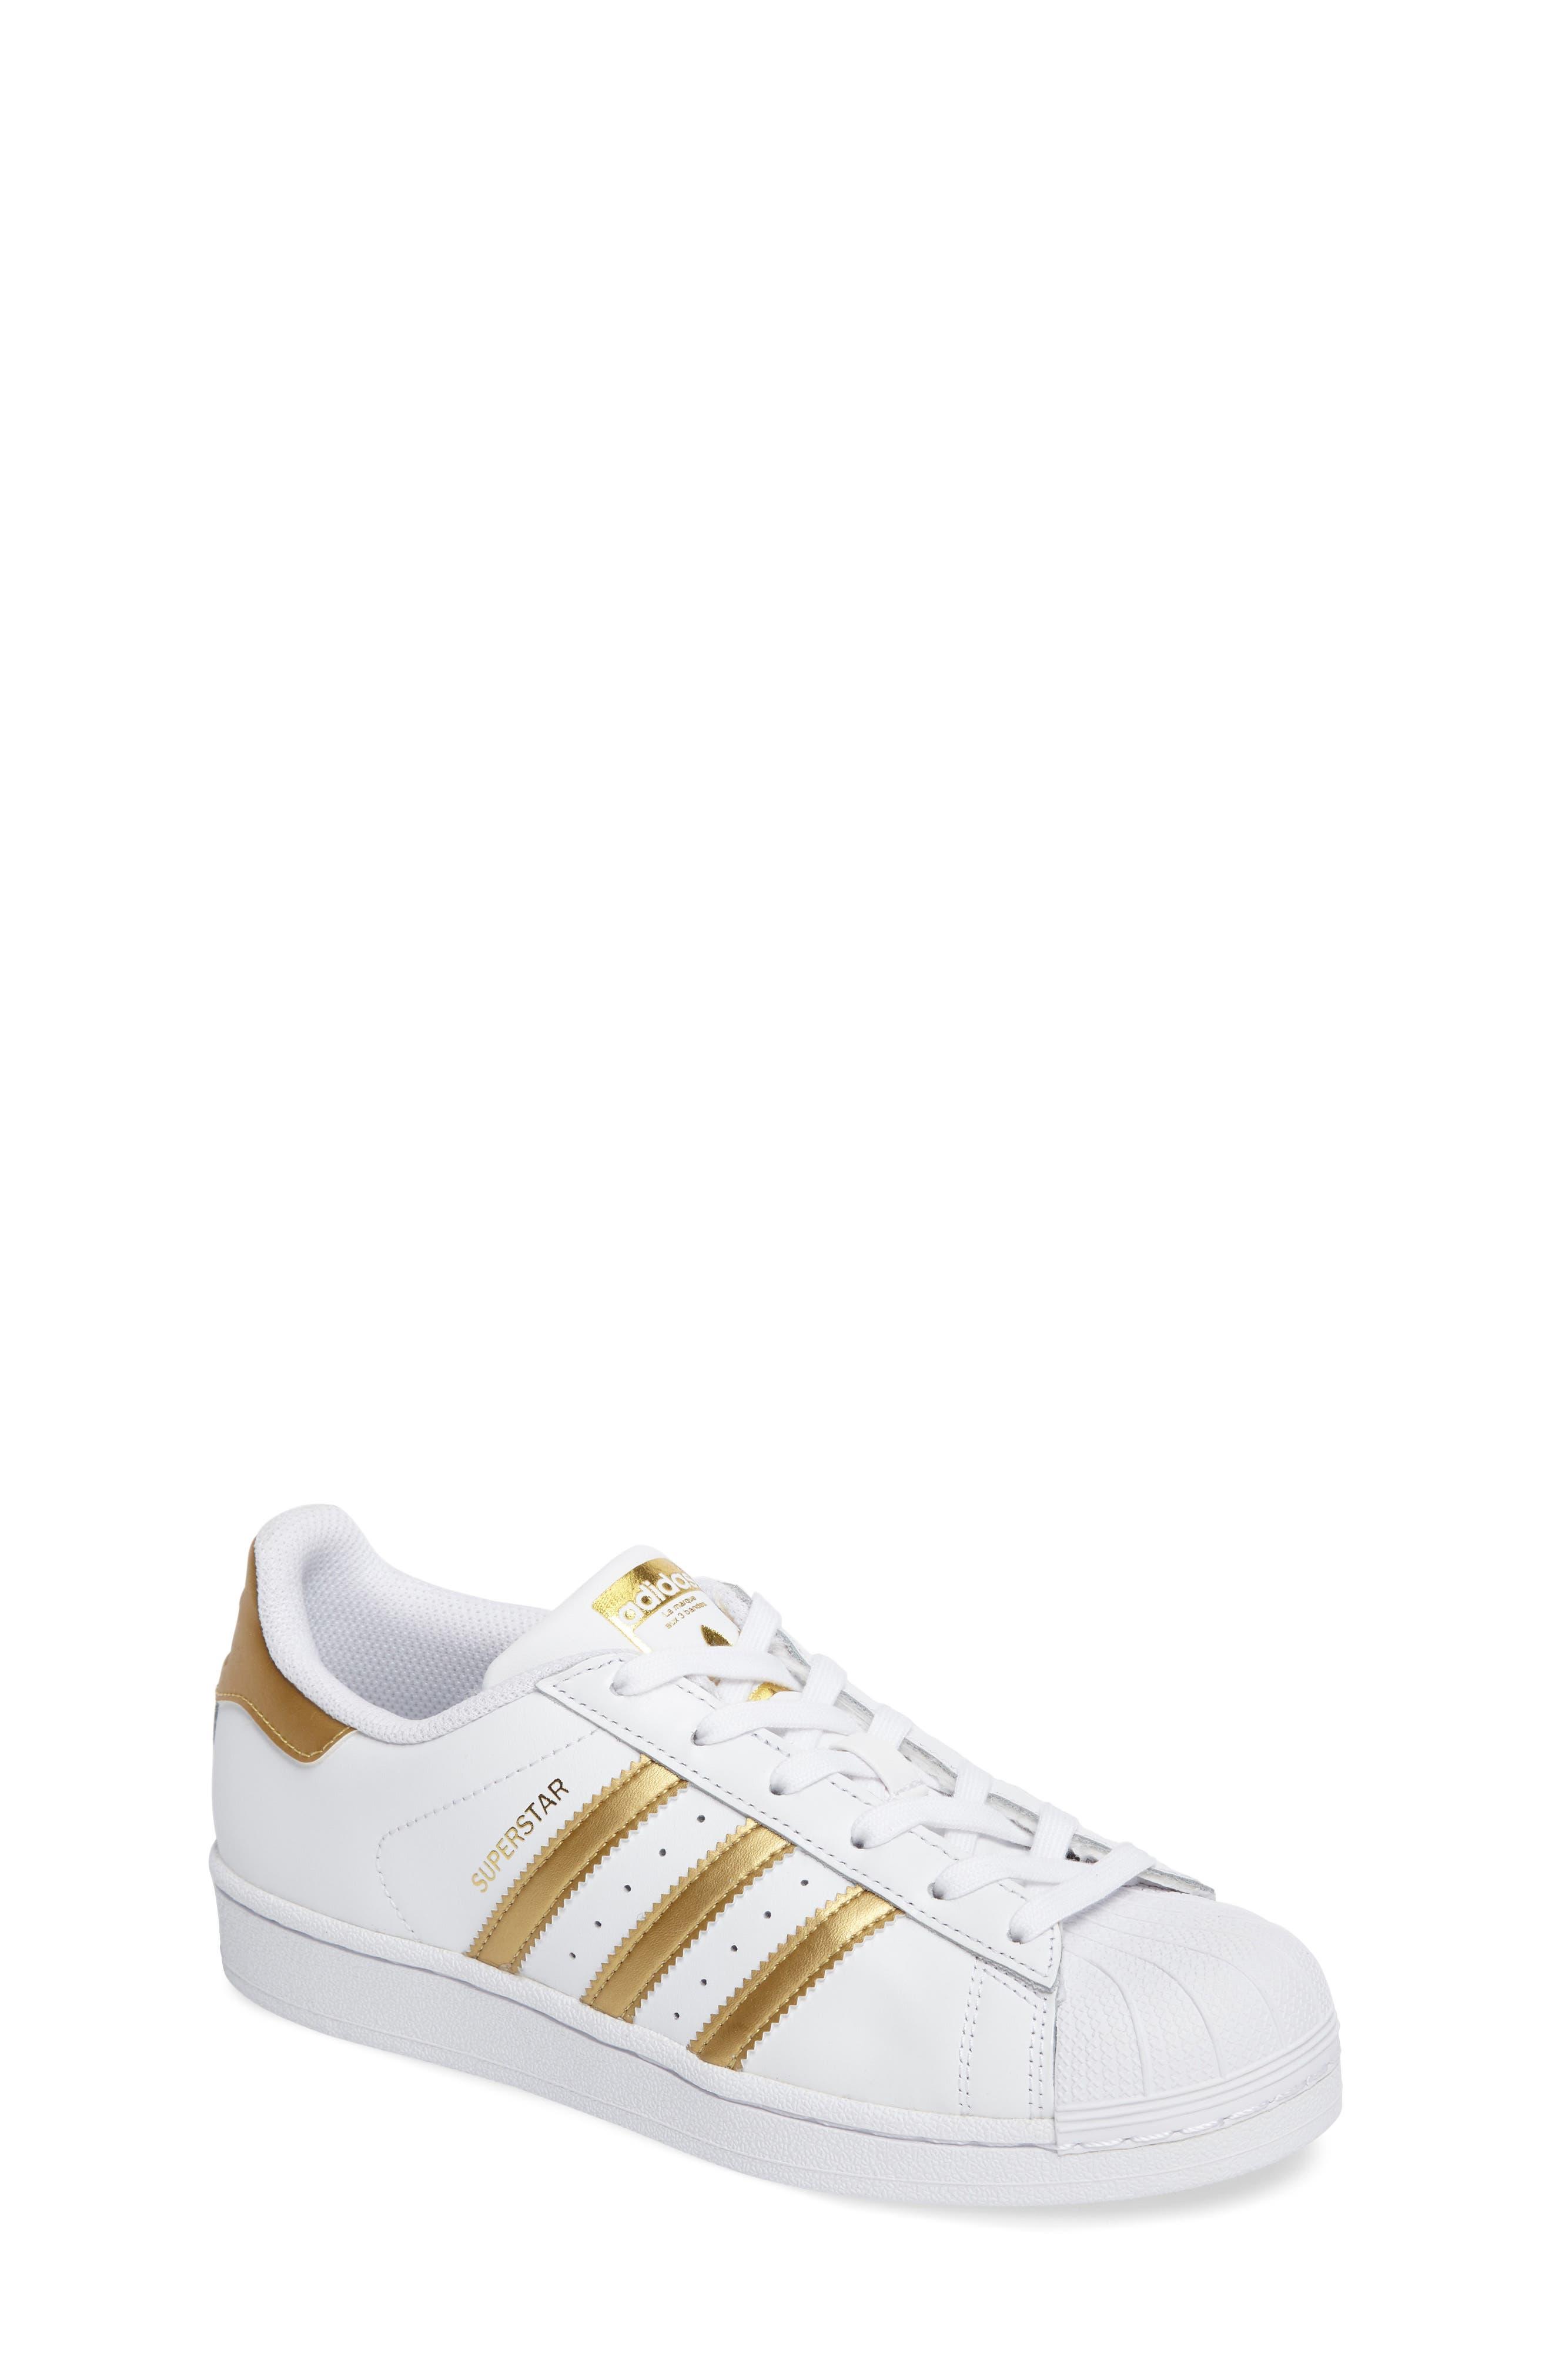 Alternate Image 1 Selected - adidas Superstar J Sneaker (Big Kid)